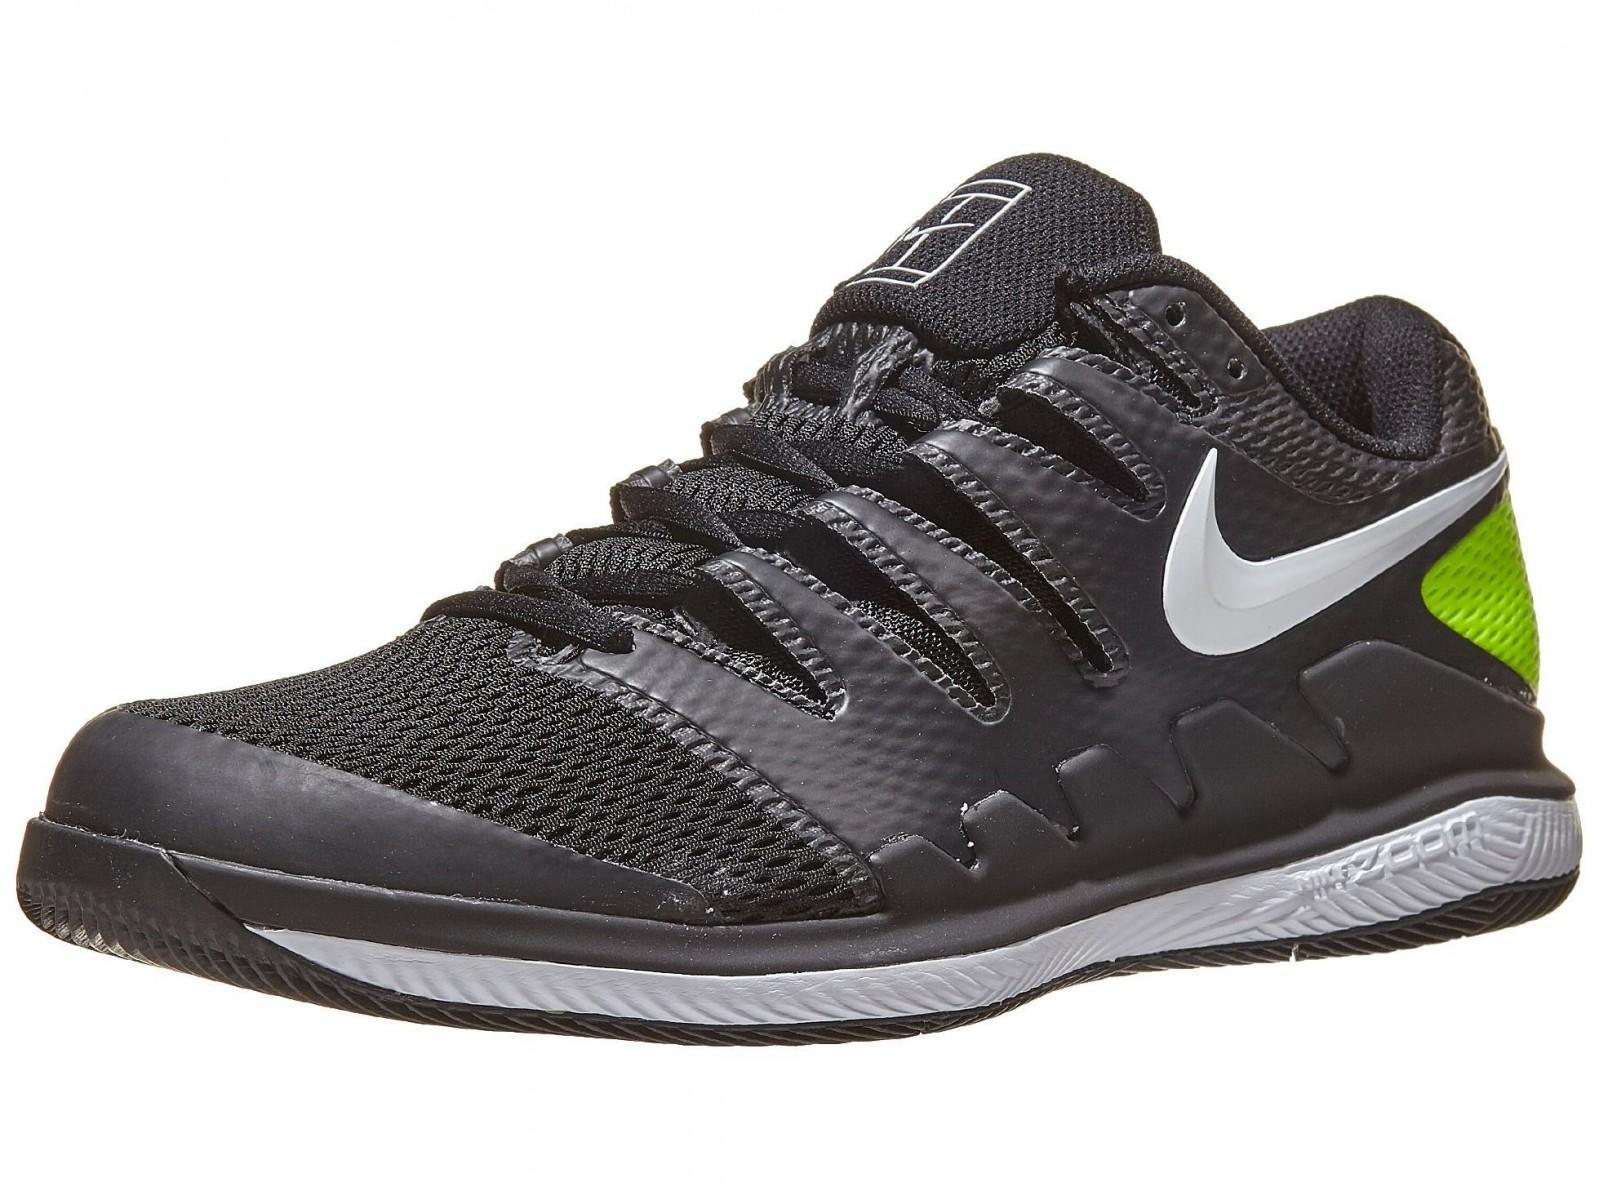 Теннисные кроссовки мужские Nike Air Zoom Vapor X black/white/volt